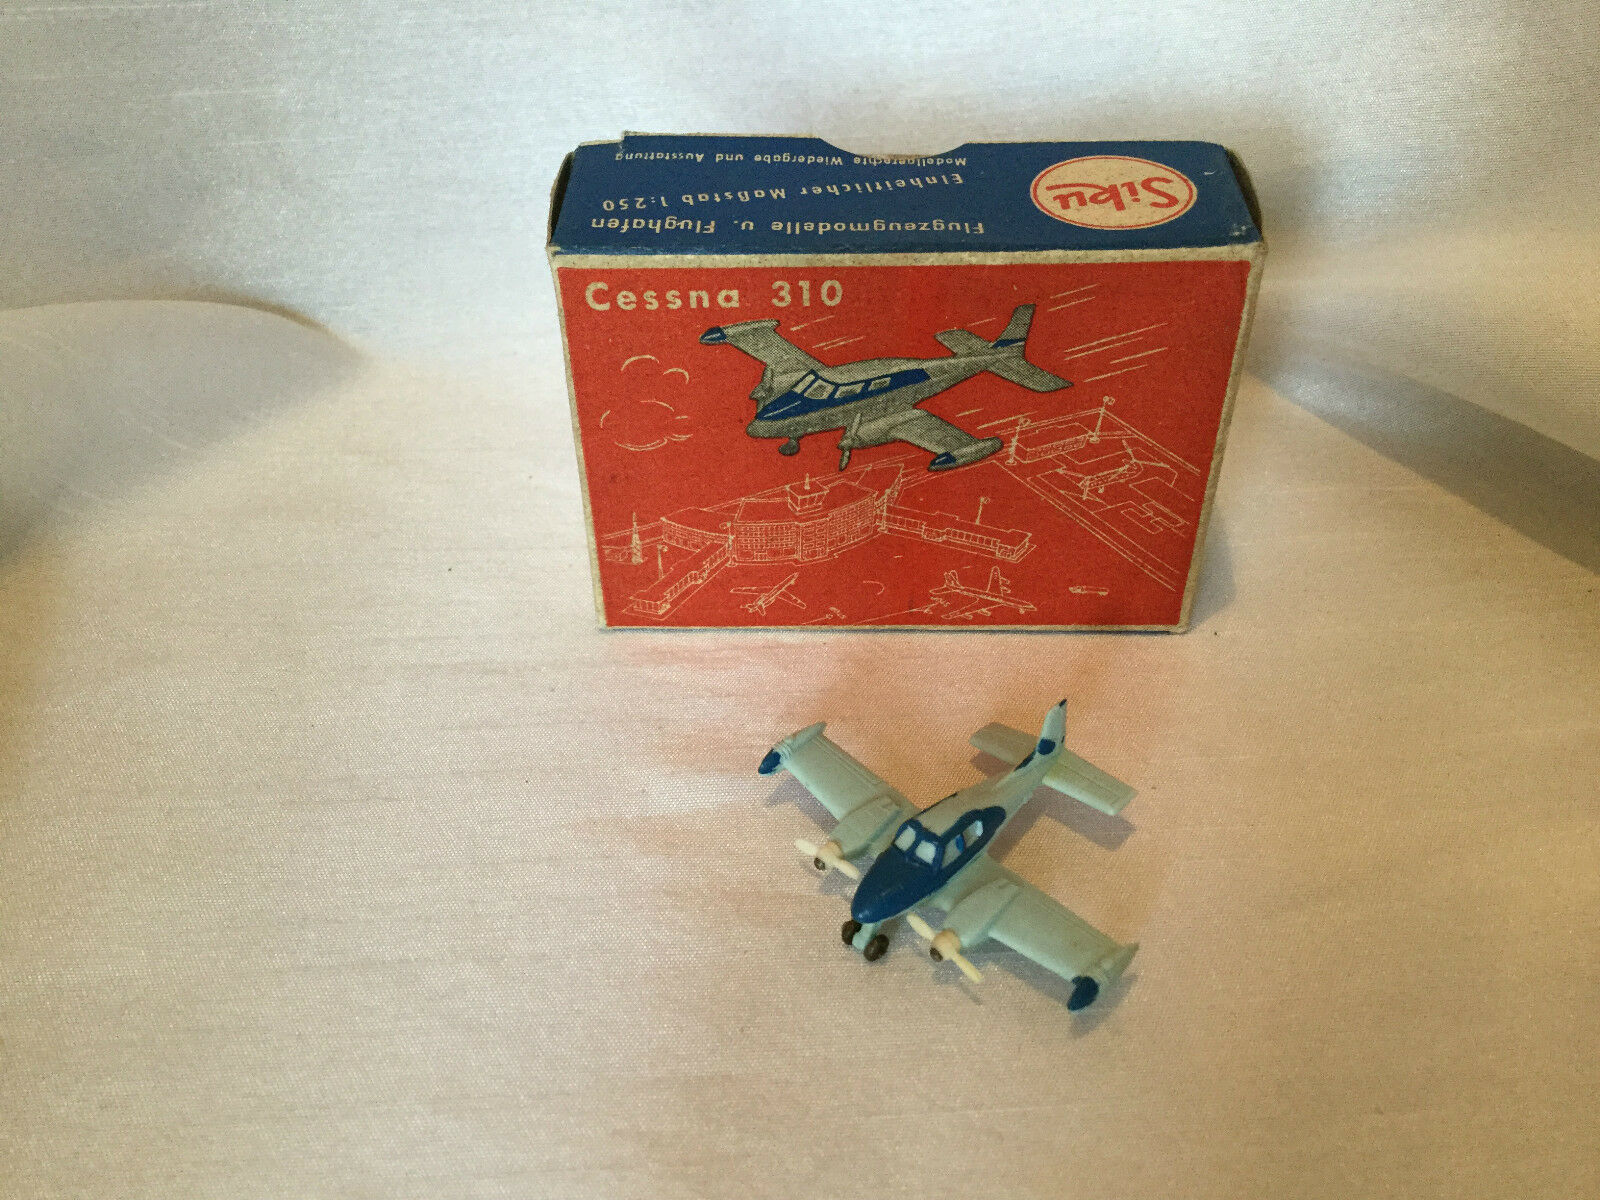 Siku plastique  f8a CESSNA 310 (voyage avion) neuf dans sa boîte  en ligne